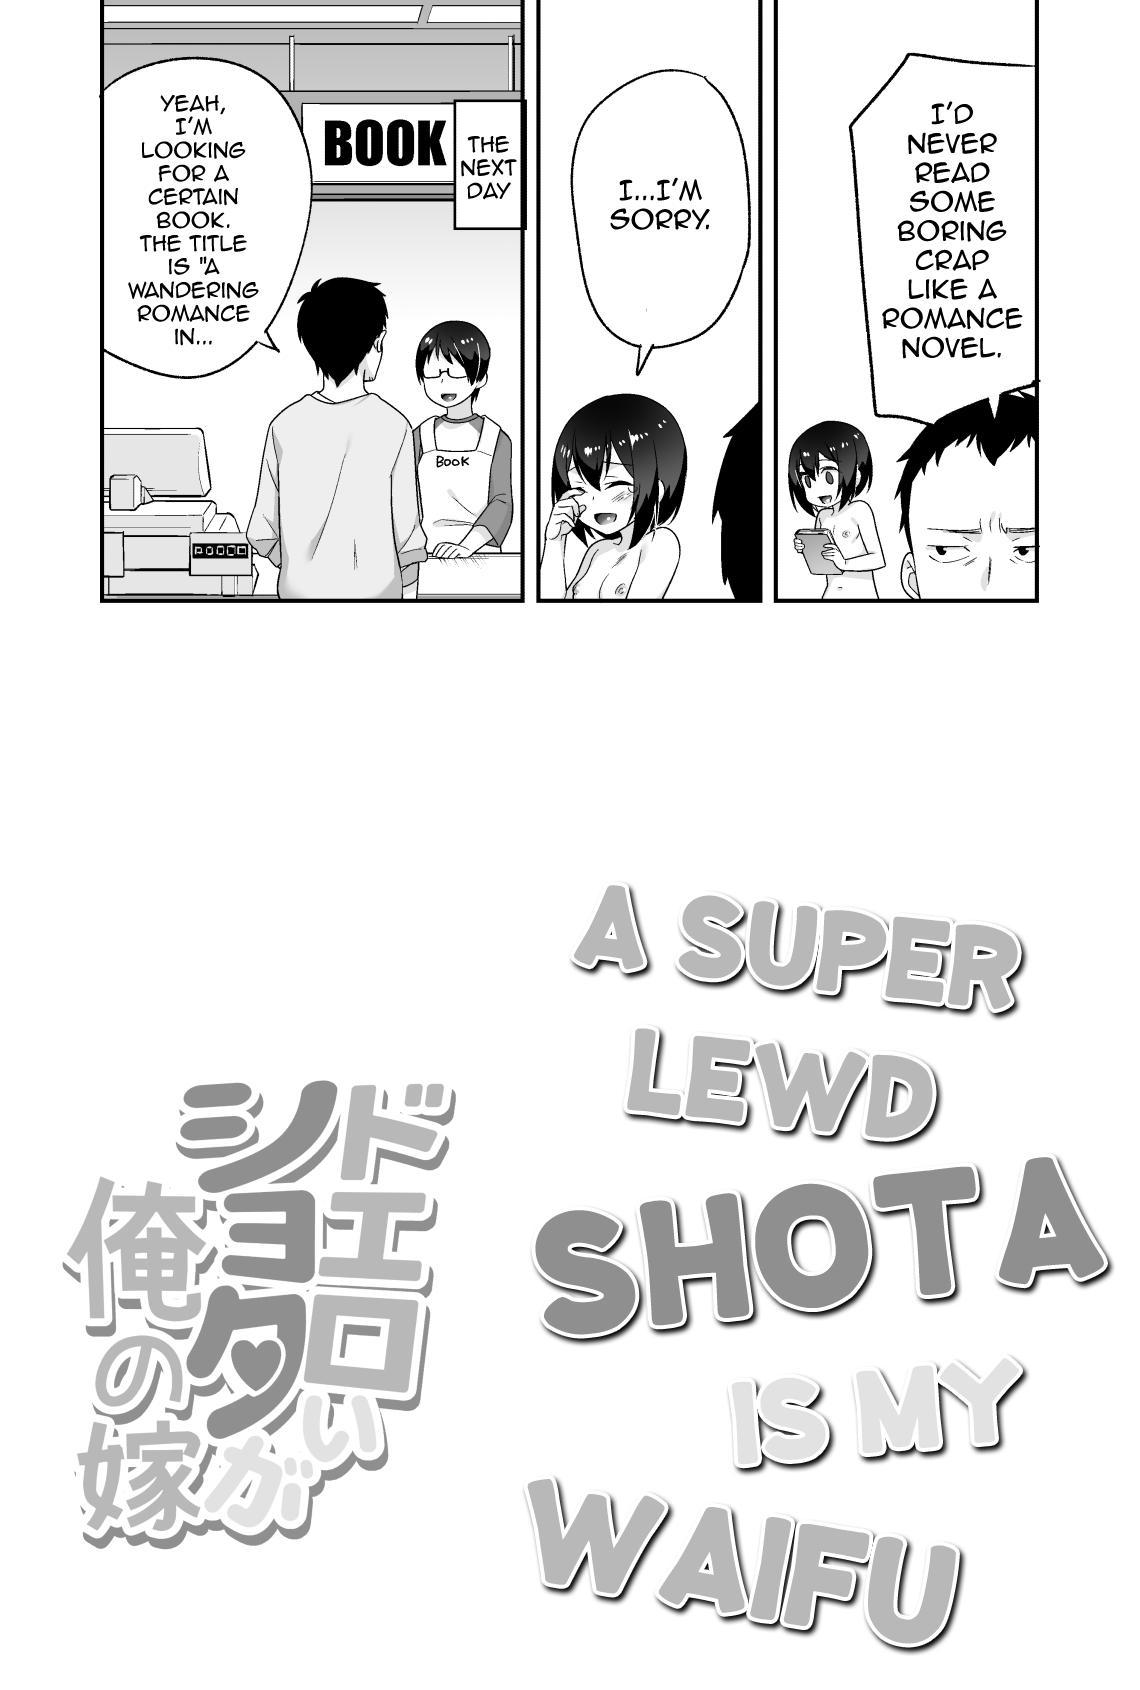 [BKG (Agawa Ryo, Toilet Komoru)] Doeroi Shota ga Ore no Yome ~Kenage na Seiyoku Shori Gangu~ | A Super Lewd Shota is My Waifu ~An Admirable Lust-Management Sex Toy~ [English] [mysterymeat3] 131